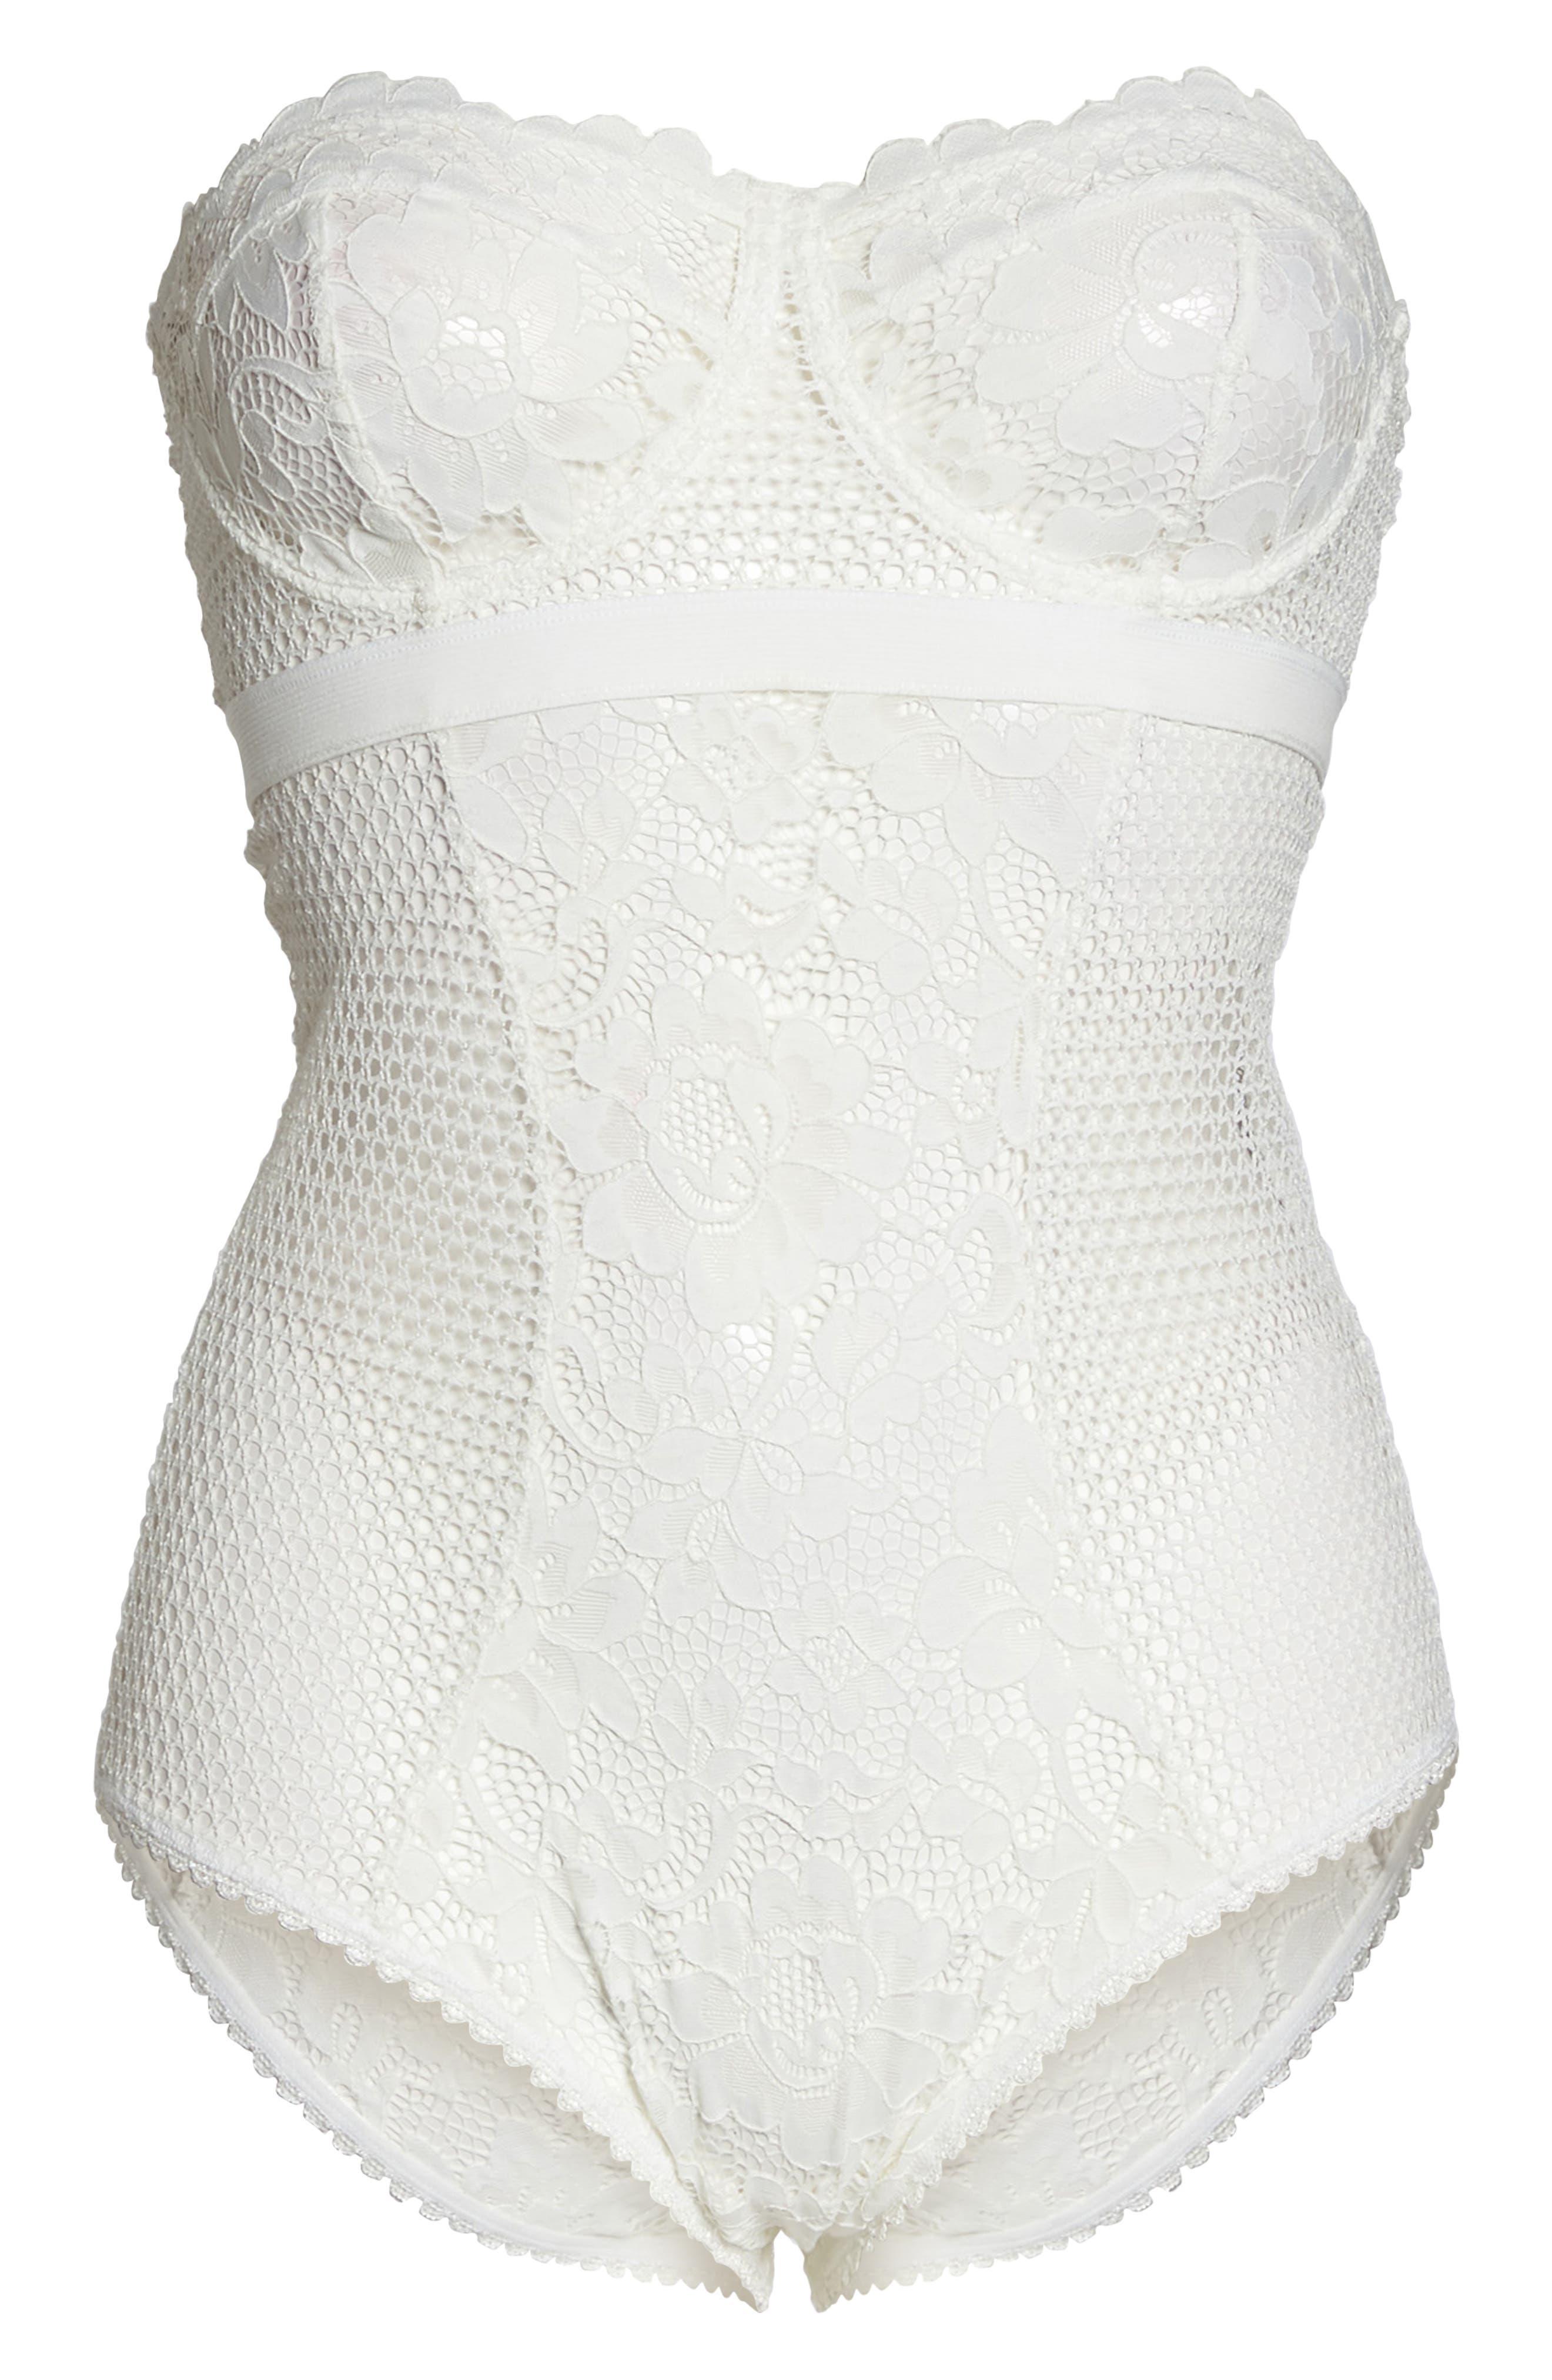 Petunia Strapless Underwire Corsette Bodysuit,                             Alternate thumbnail 4, color,                             Ivory